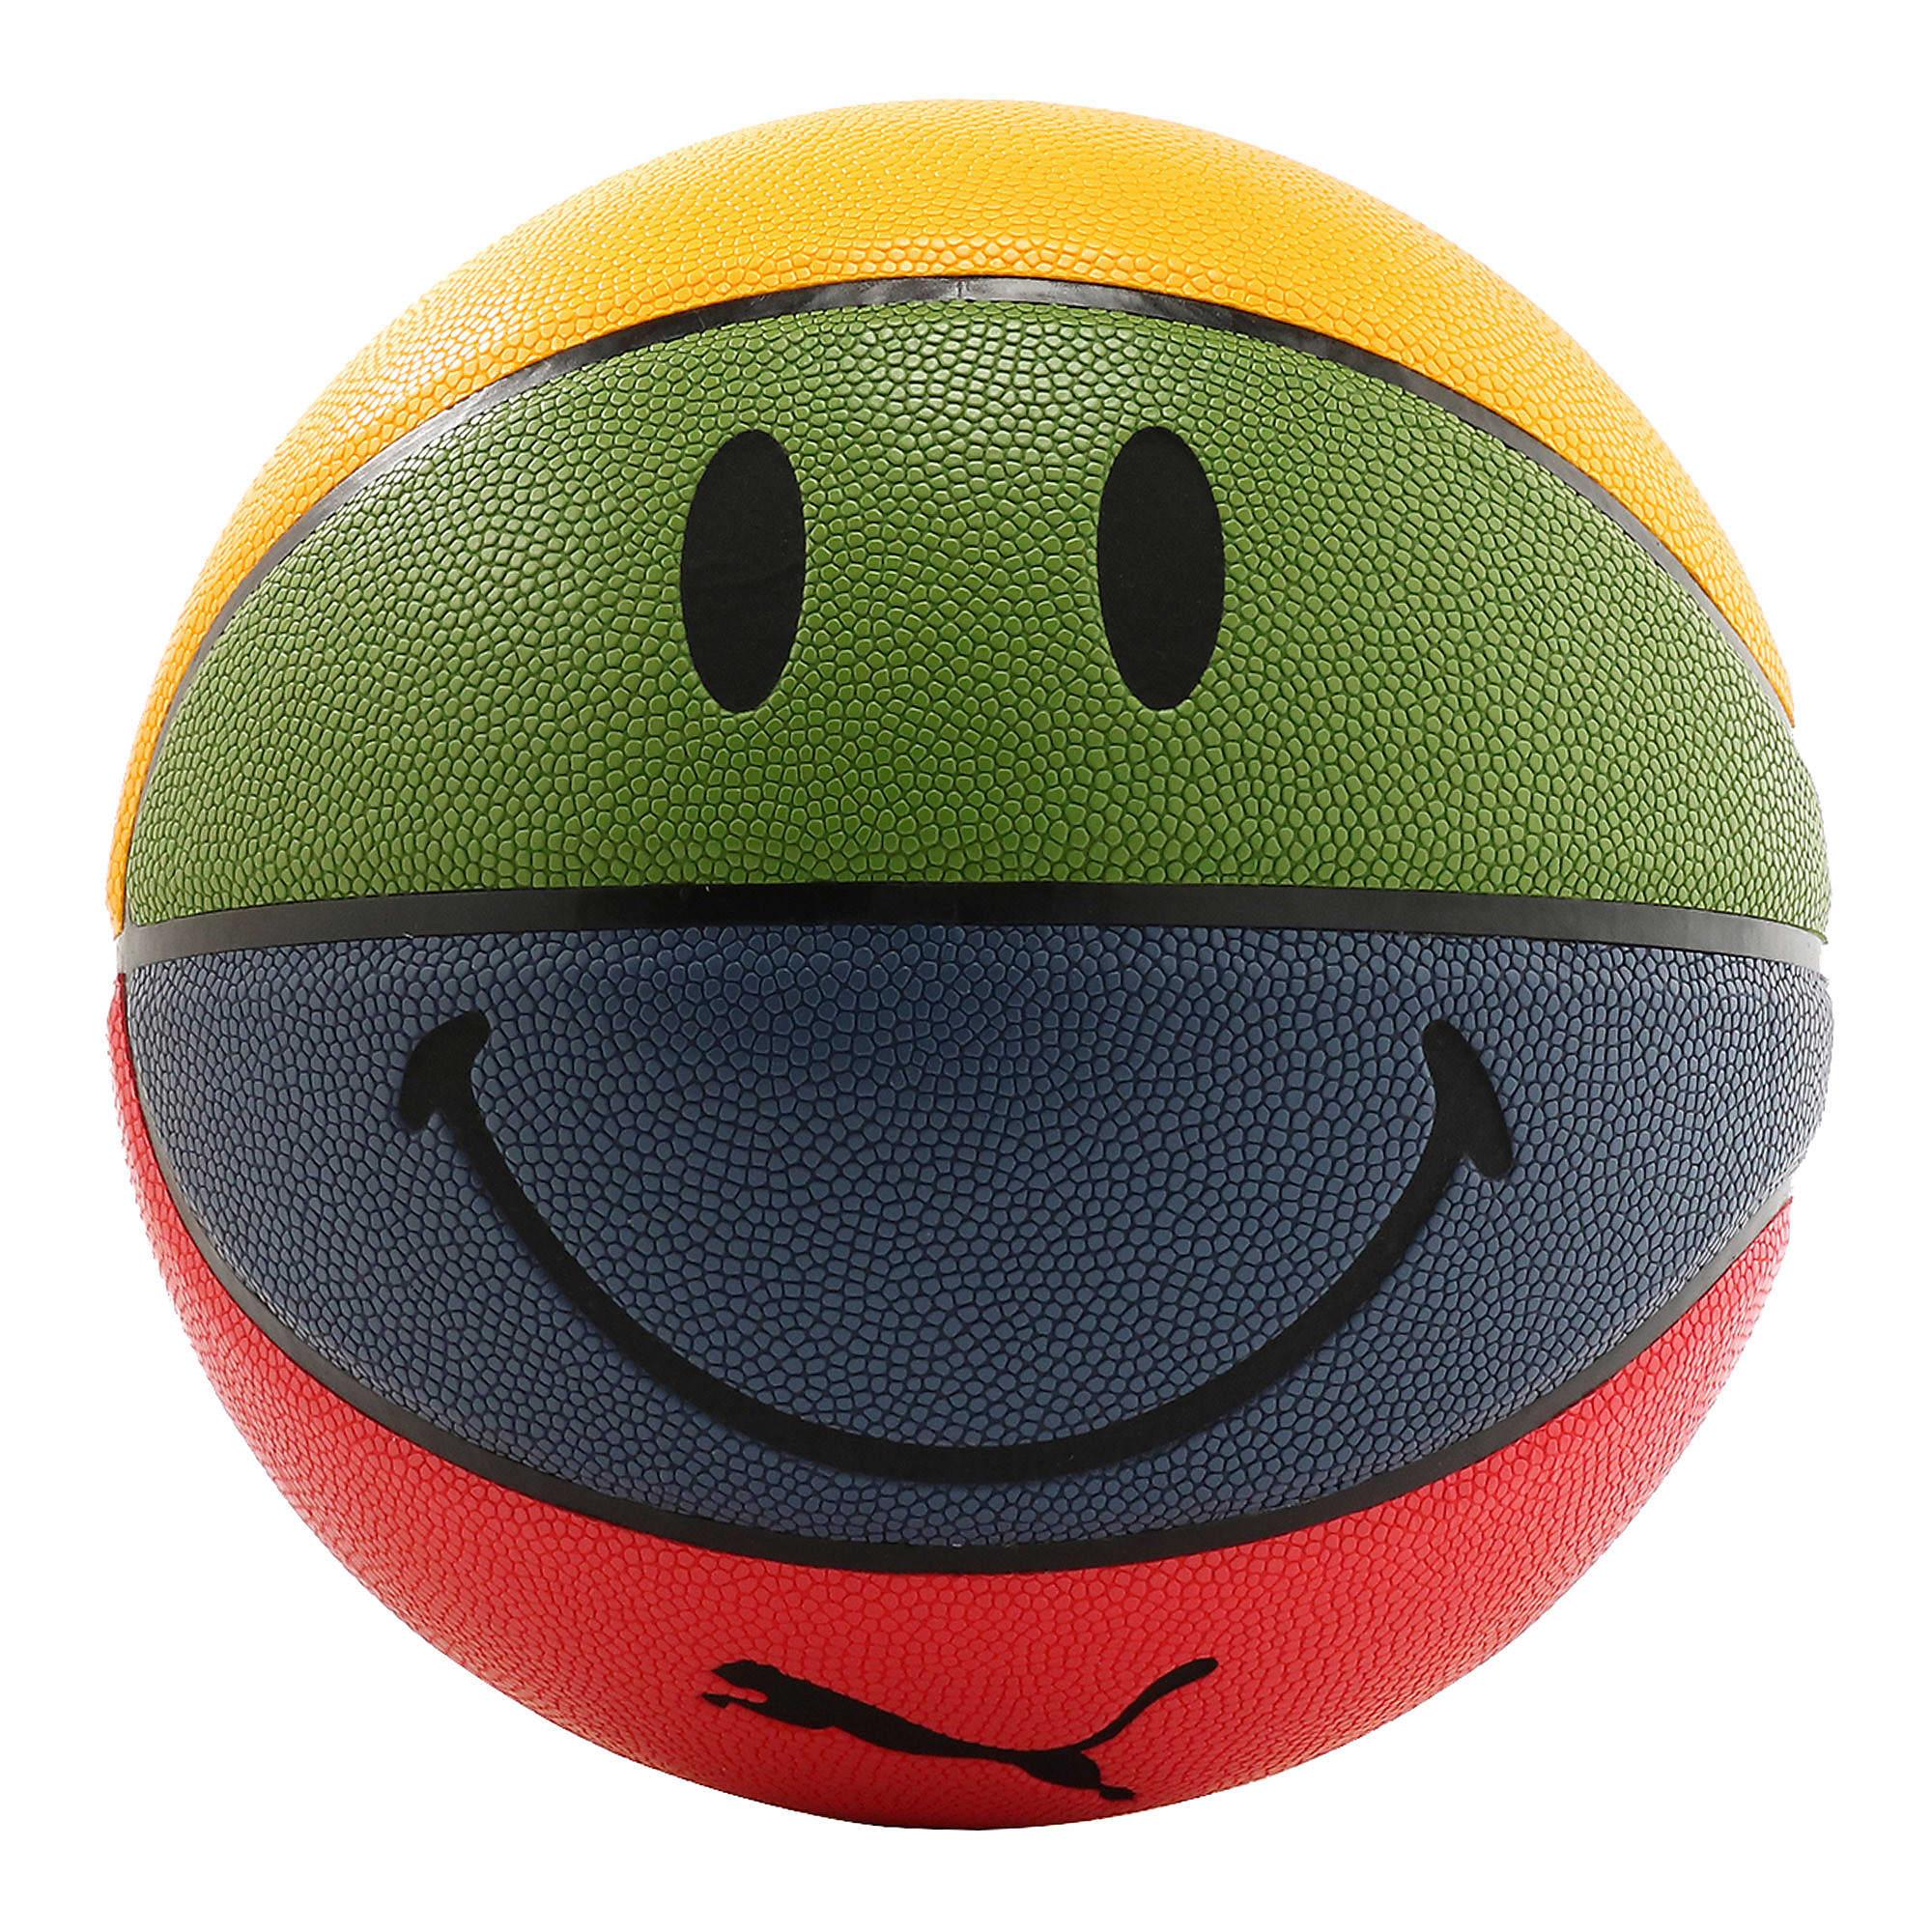 Thumbnail 1 of PUMA x CHINATOWN MARKET バスケットボール, Multi, medium-JPN